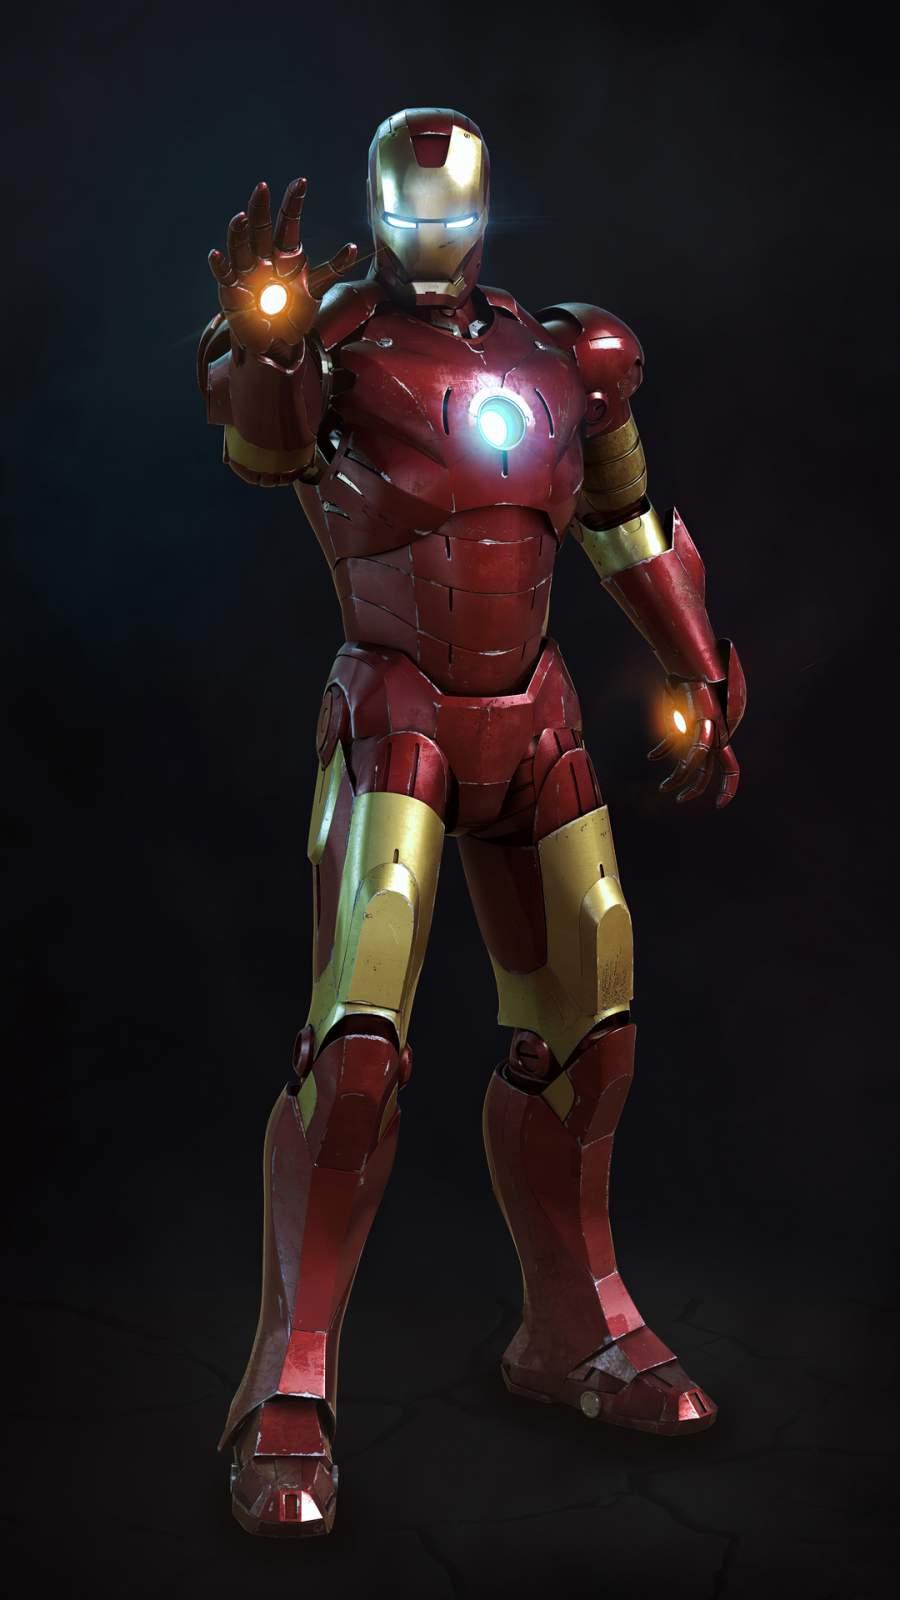 4K Iron Man 2020 iPhone Wallpaper